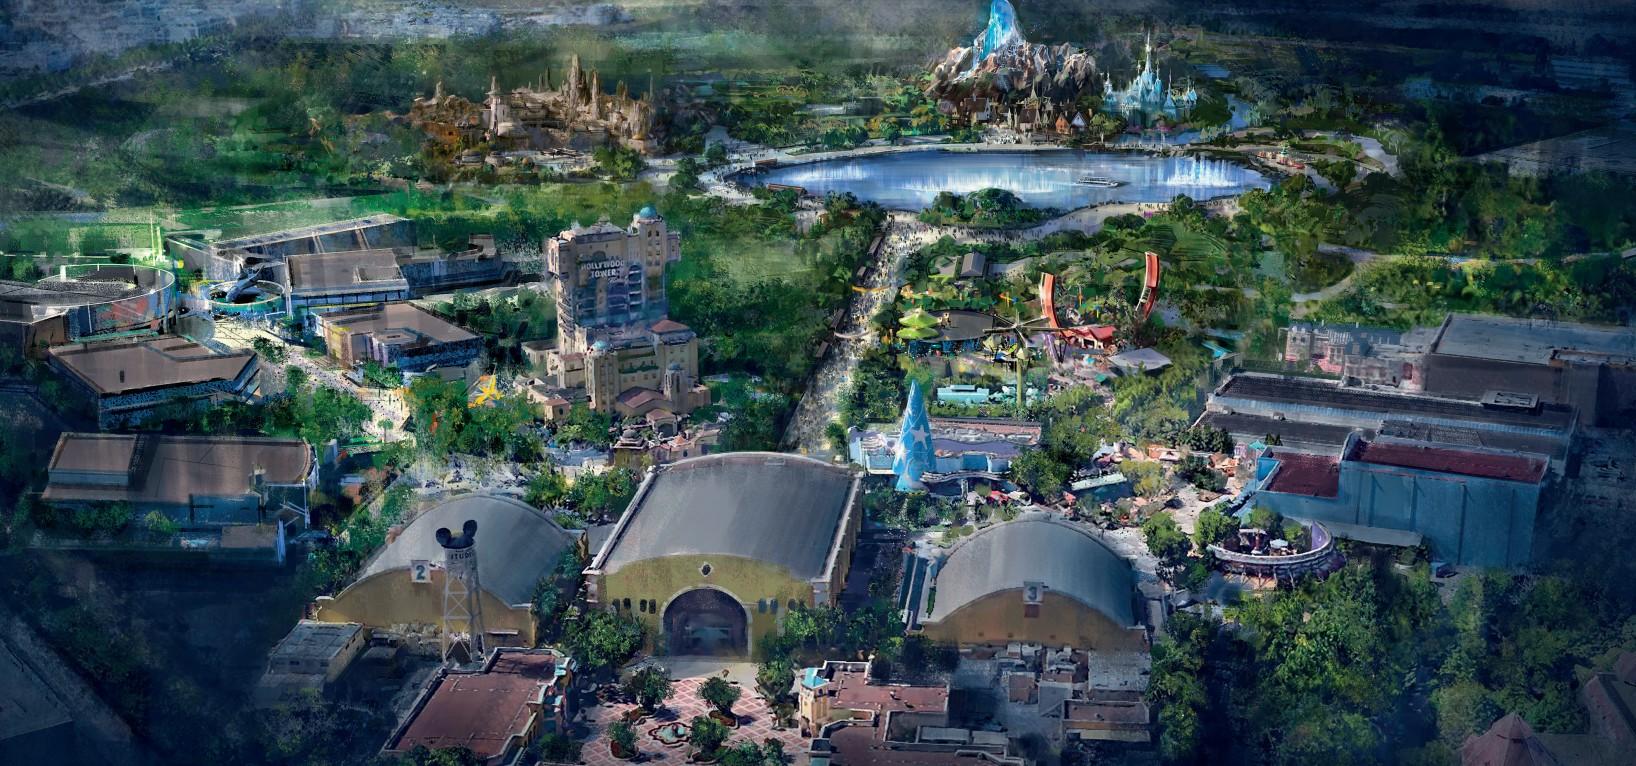 Walt Disney Studios - Concept art 2025